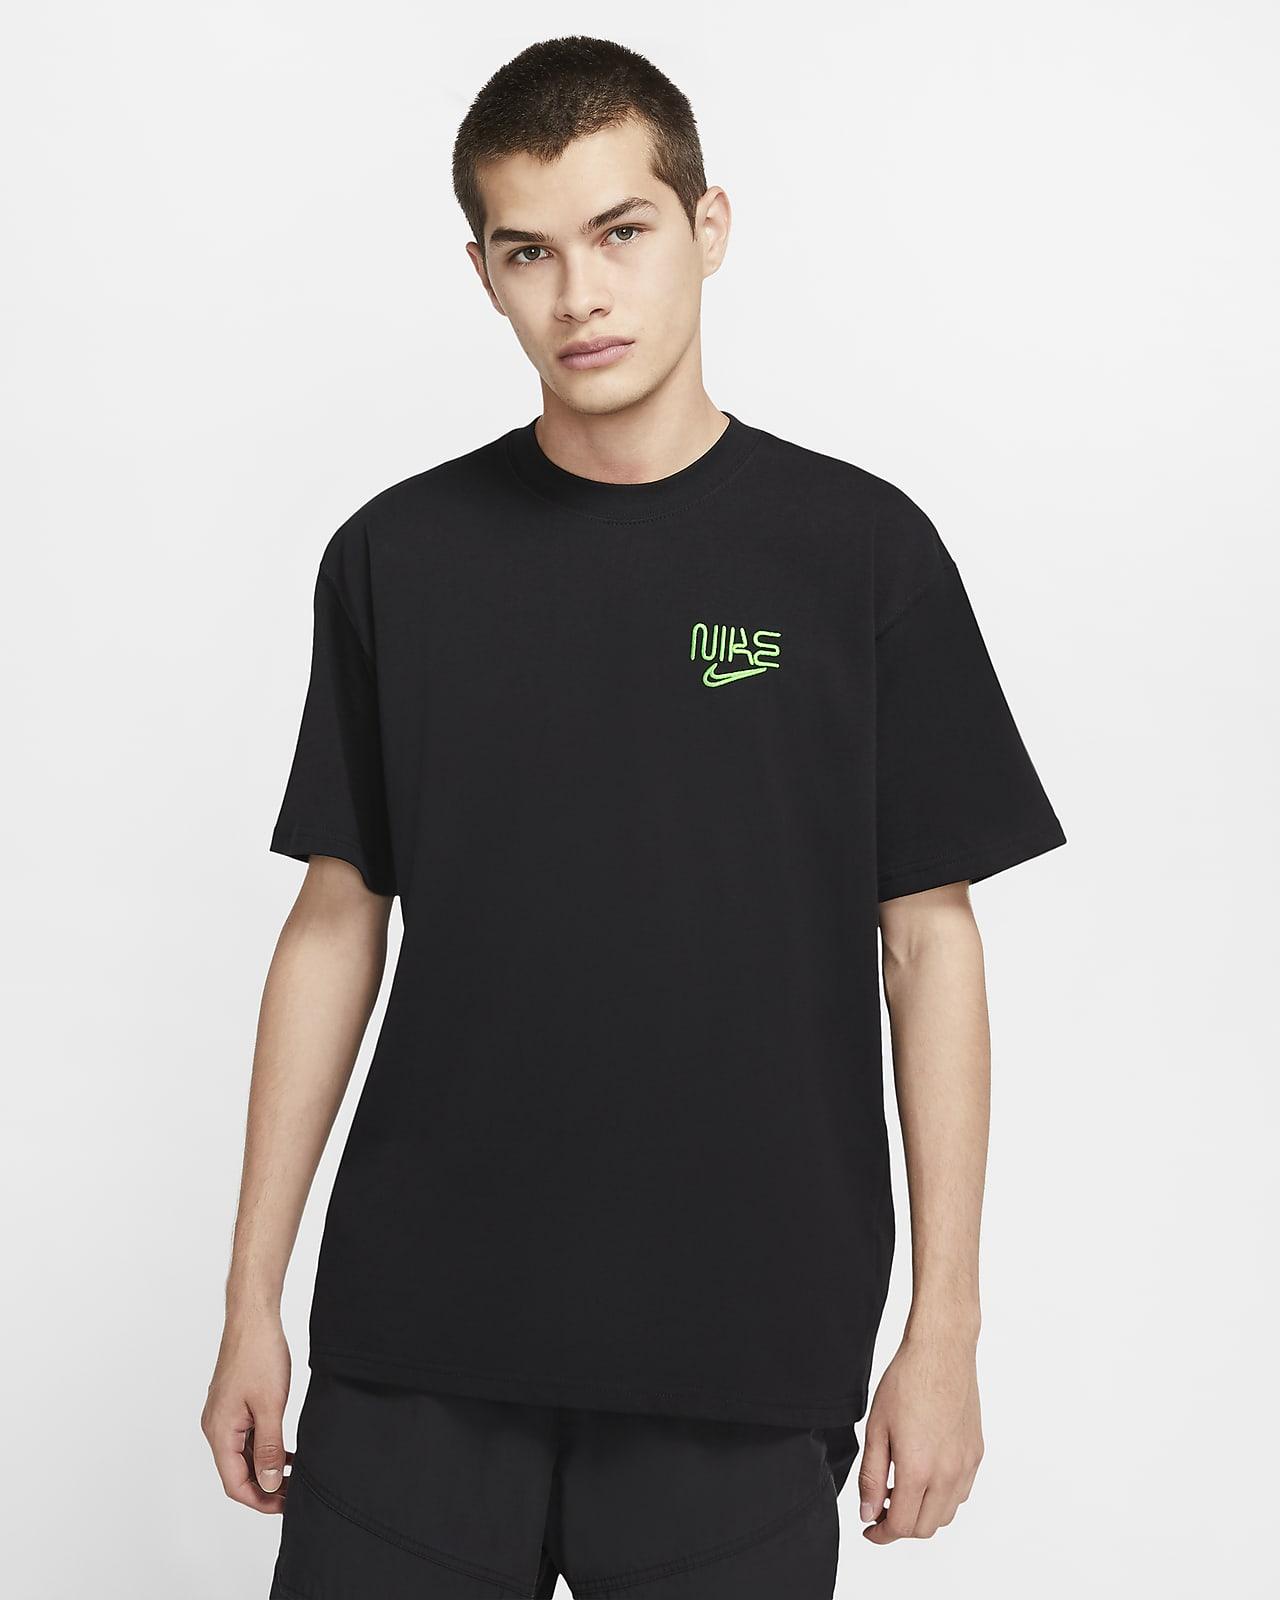 Nike Miami Men's Basketball T-Shirt